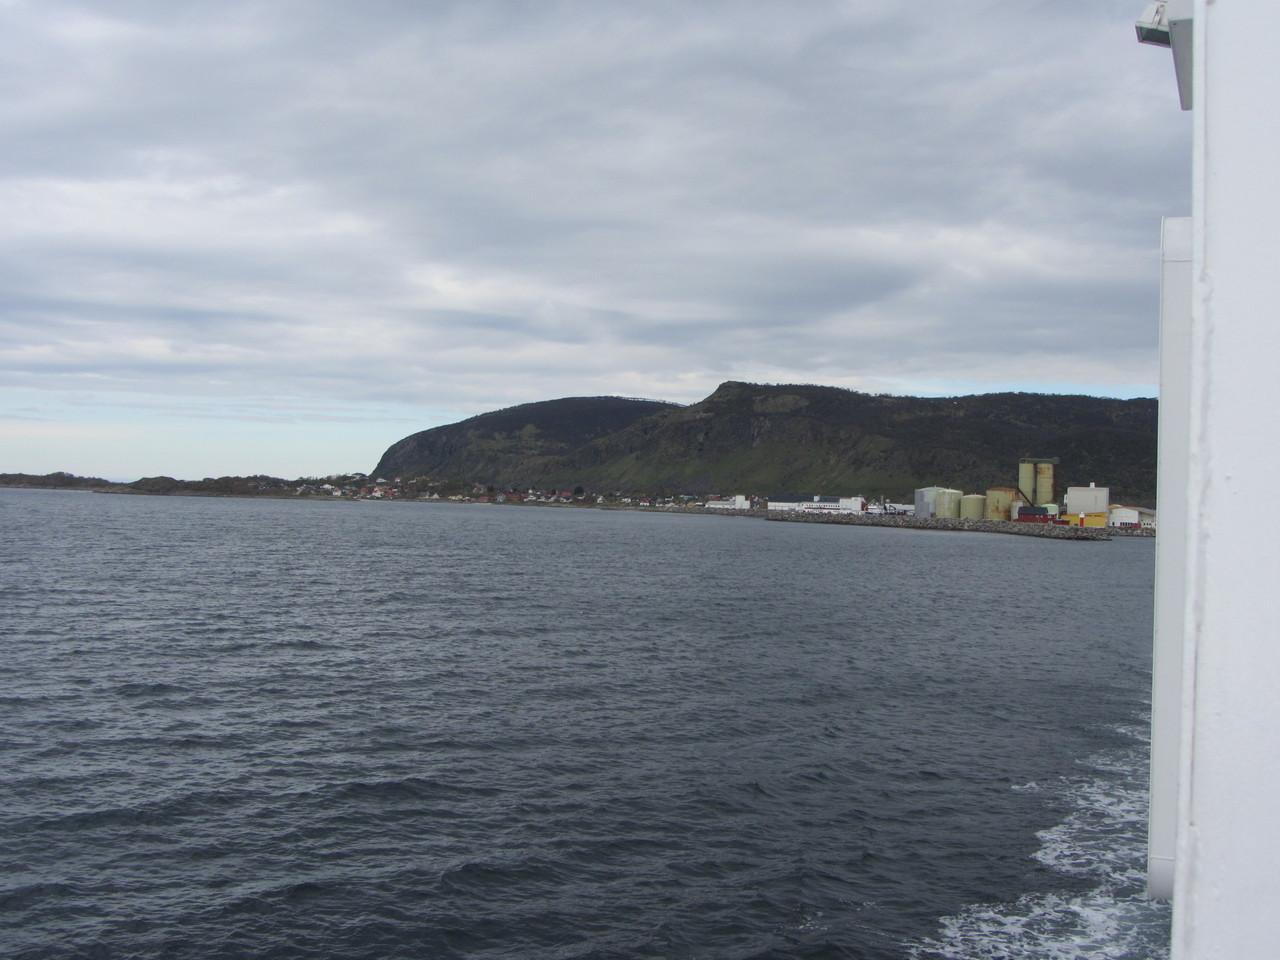 den Hadselfjorden nach Fiskebøl.